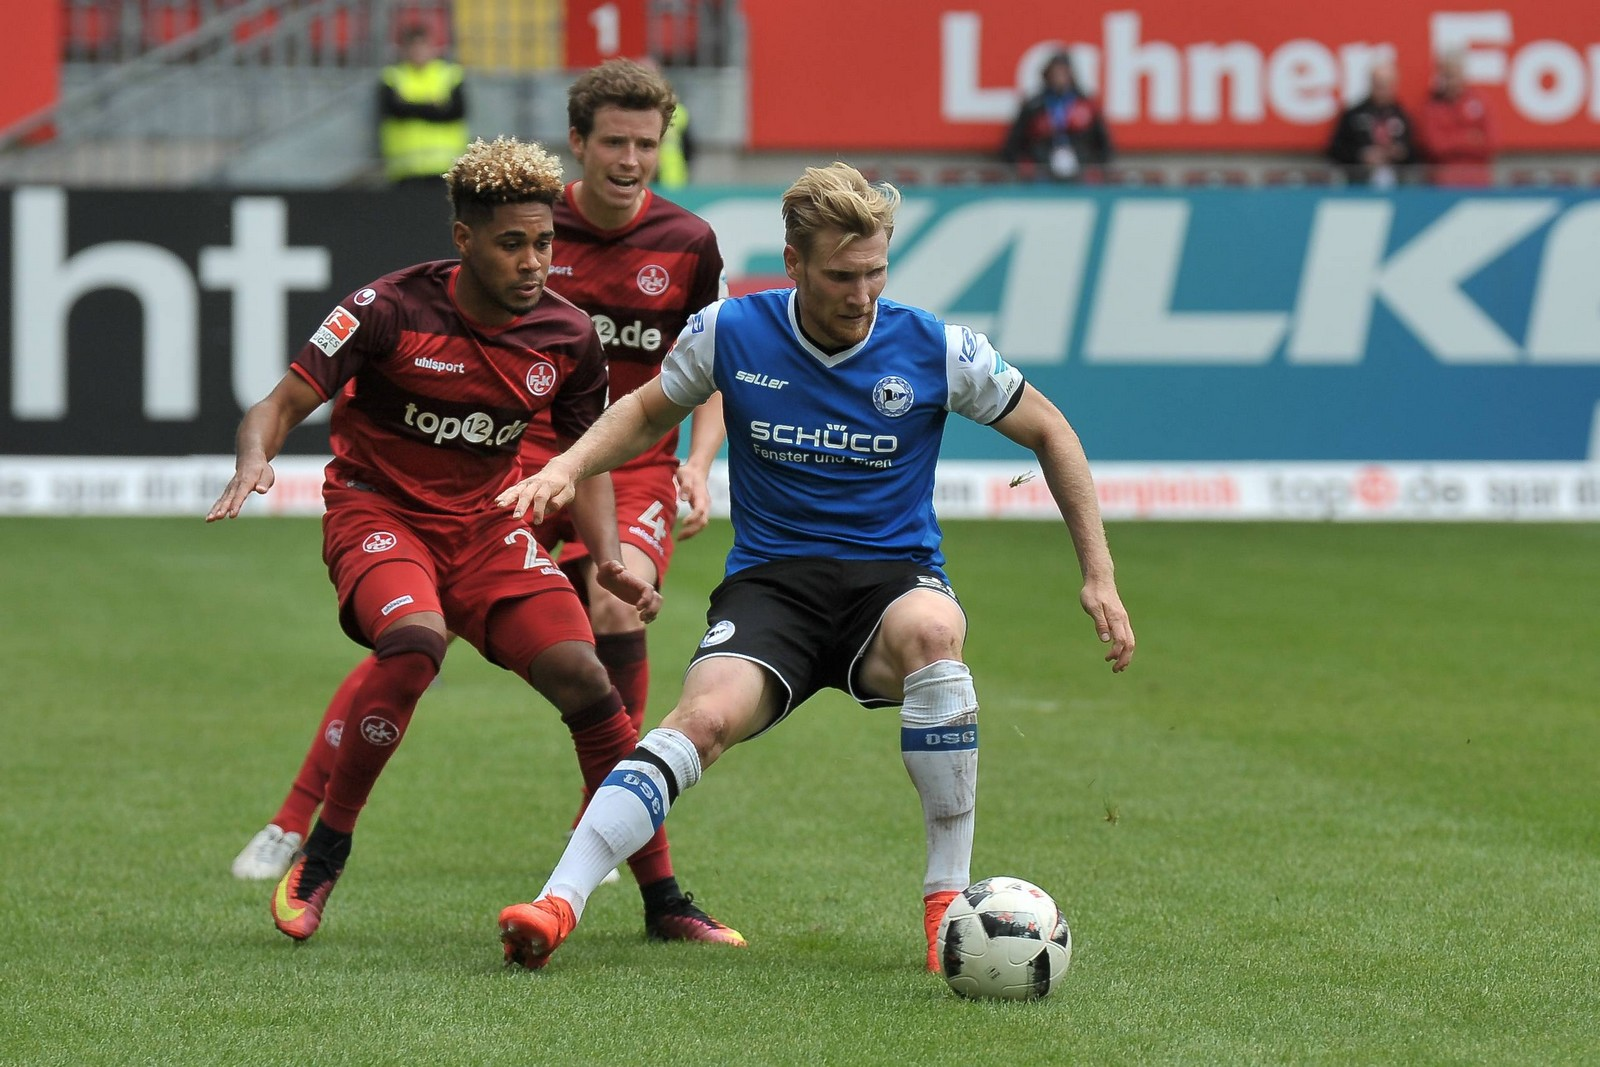 02 10 2016 xtkx Fussball 2 Bundesliga 1 FC Kaiserslautern Arminia Bielefeld emspor v l Phil